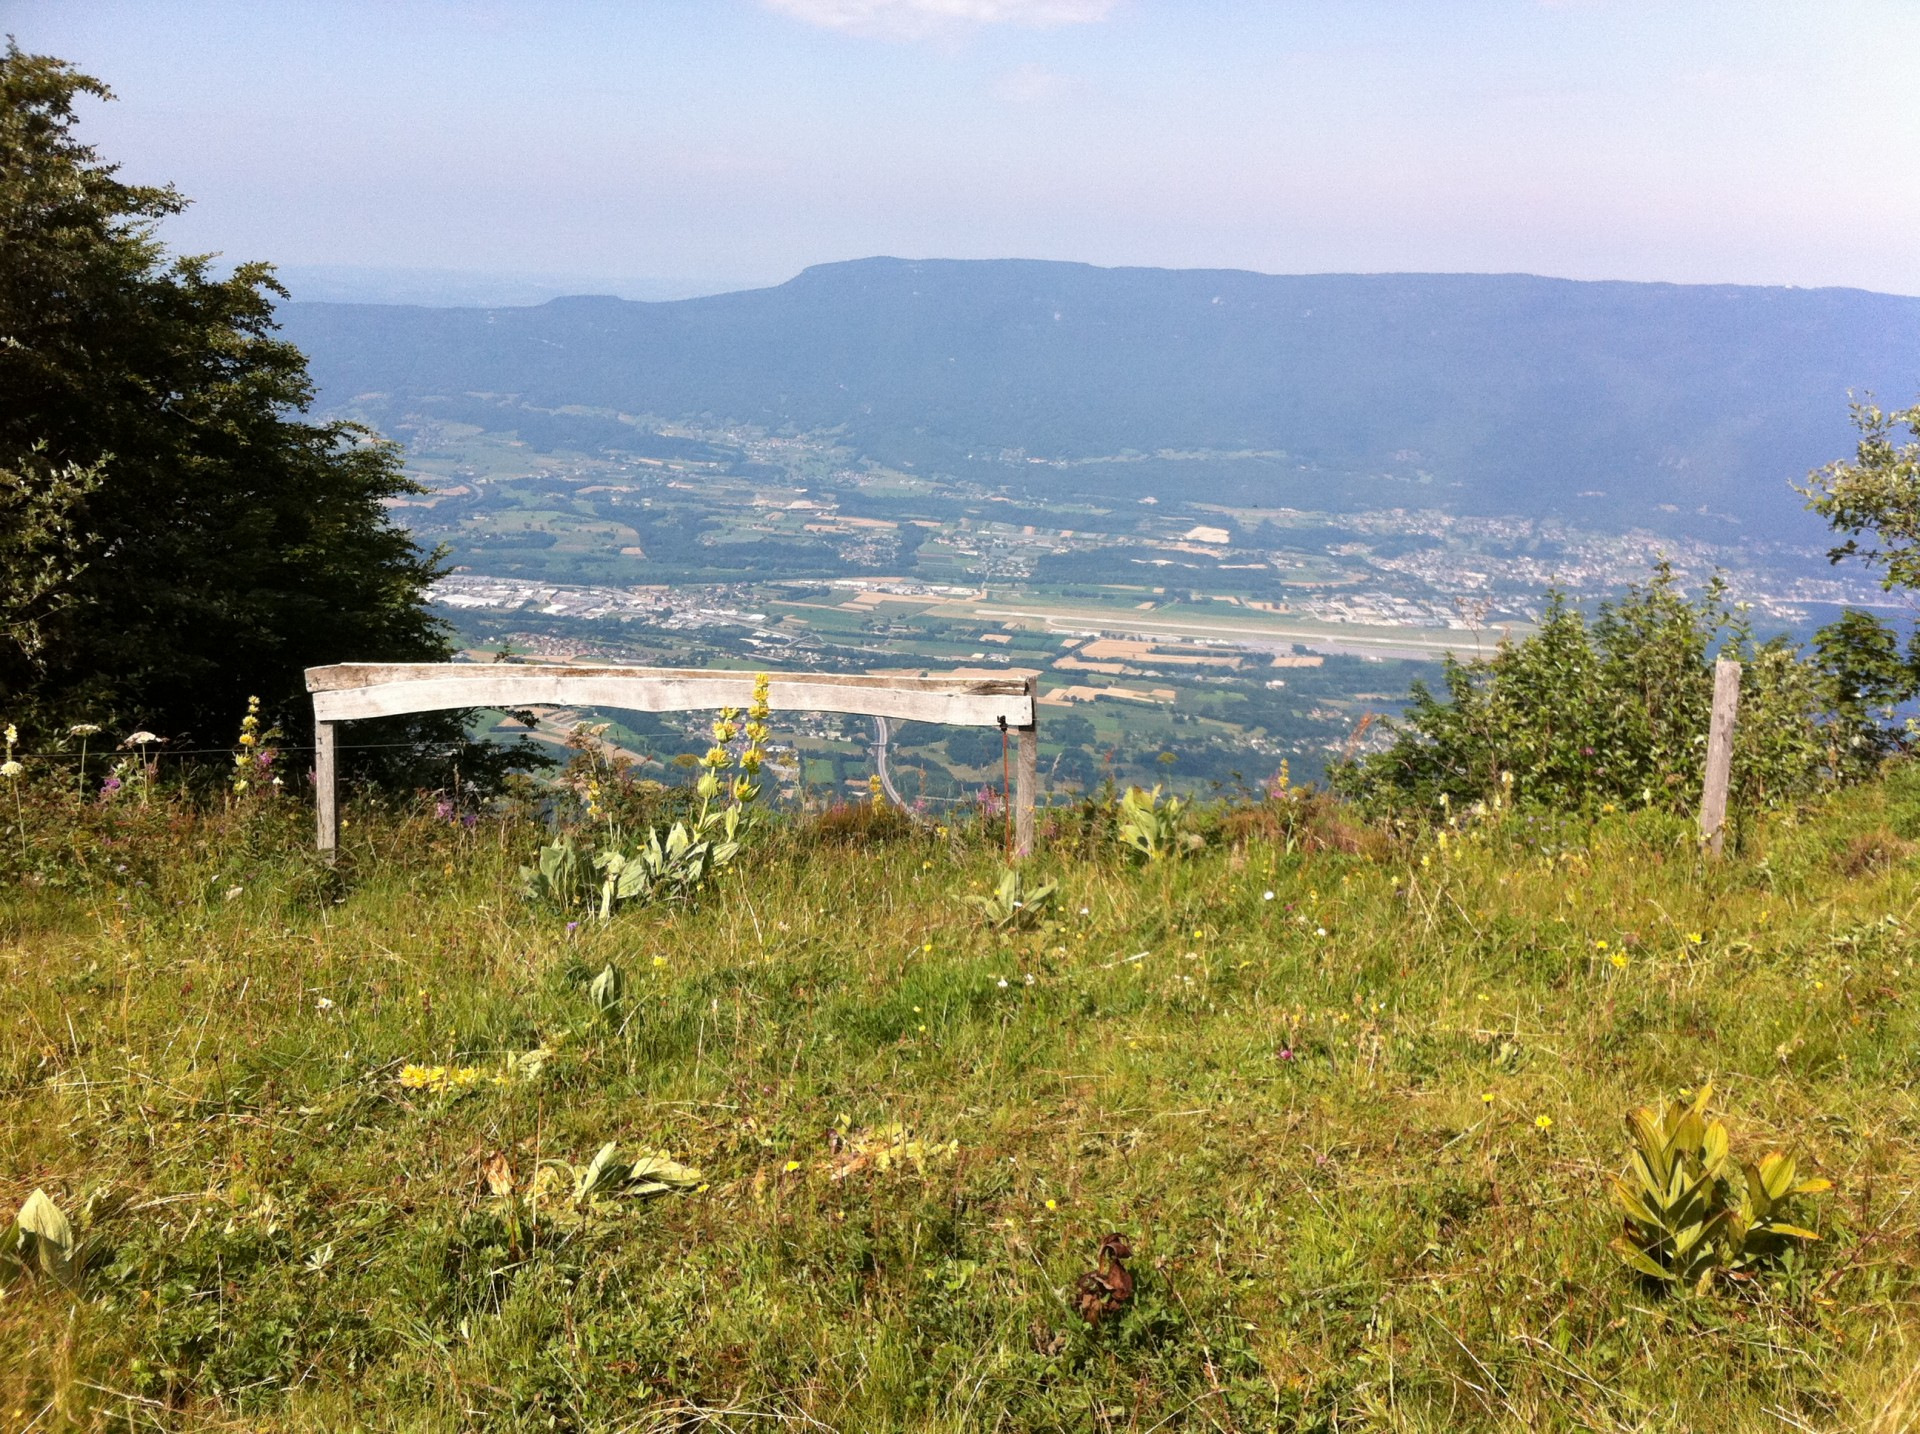 belvedere-de-l-orionde-la-feclaz-9-455